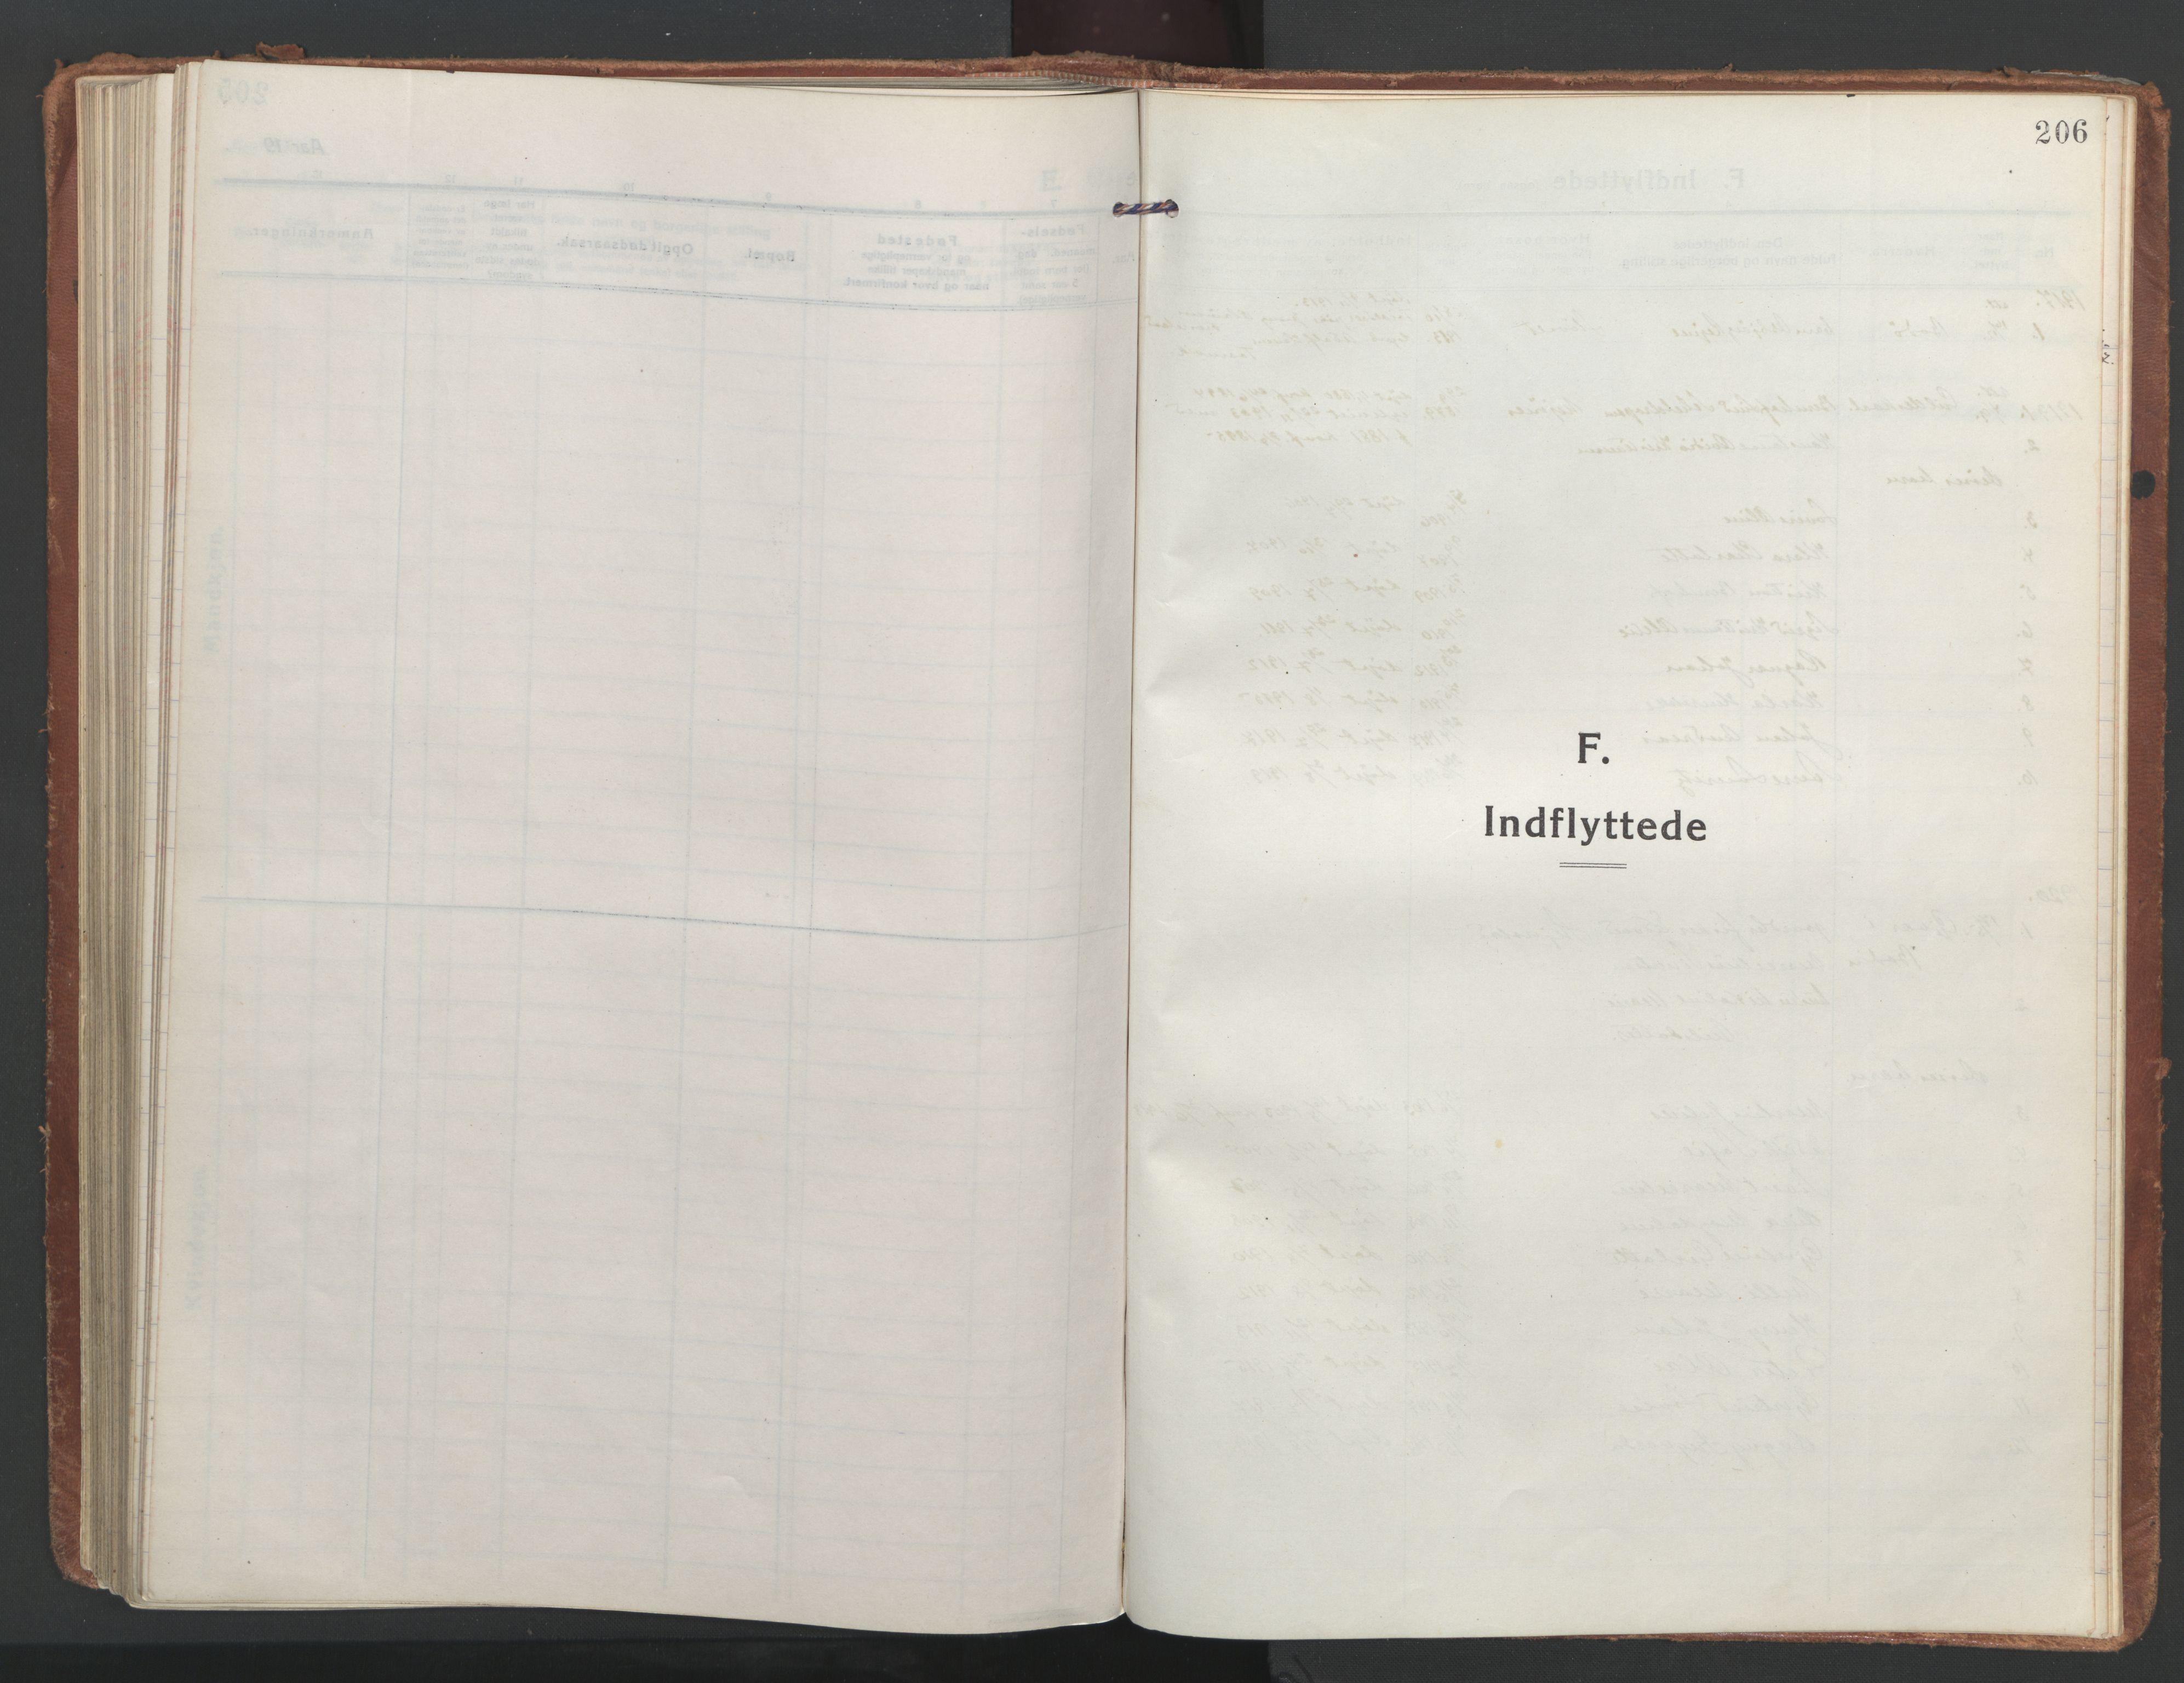 SAT, Ministerialprotokoller, klokkerbøker og fødselsregistre - Nordland, 852/L0748: Ministerialbok nr. 852A18, 1913-1932, s. 206